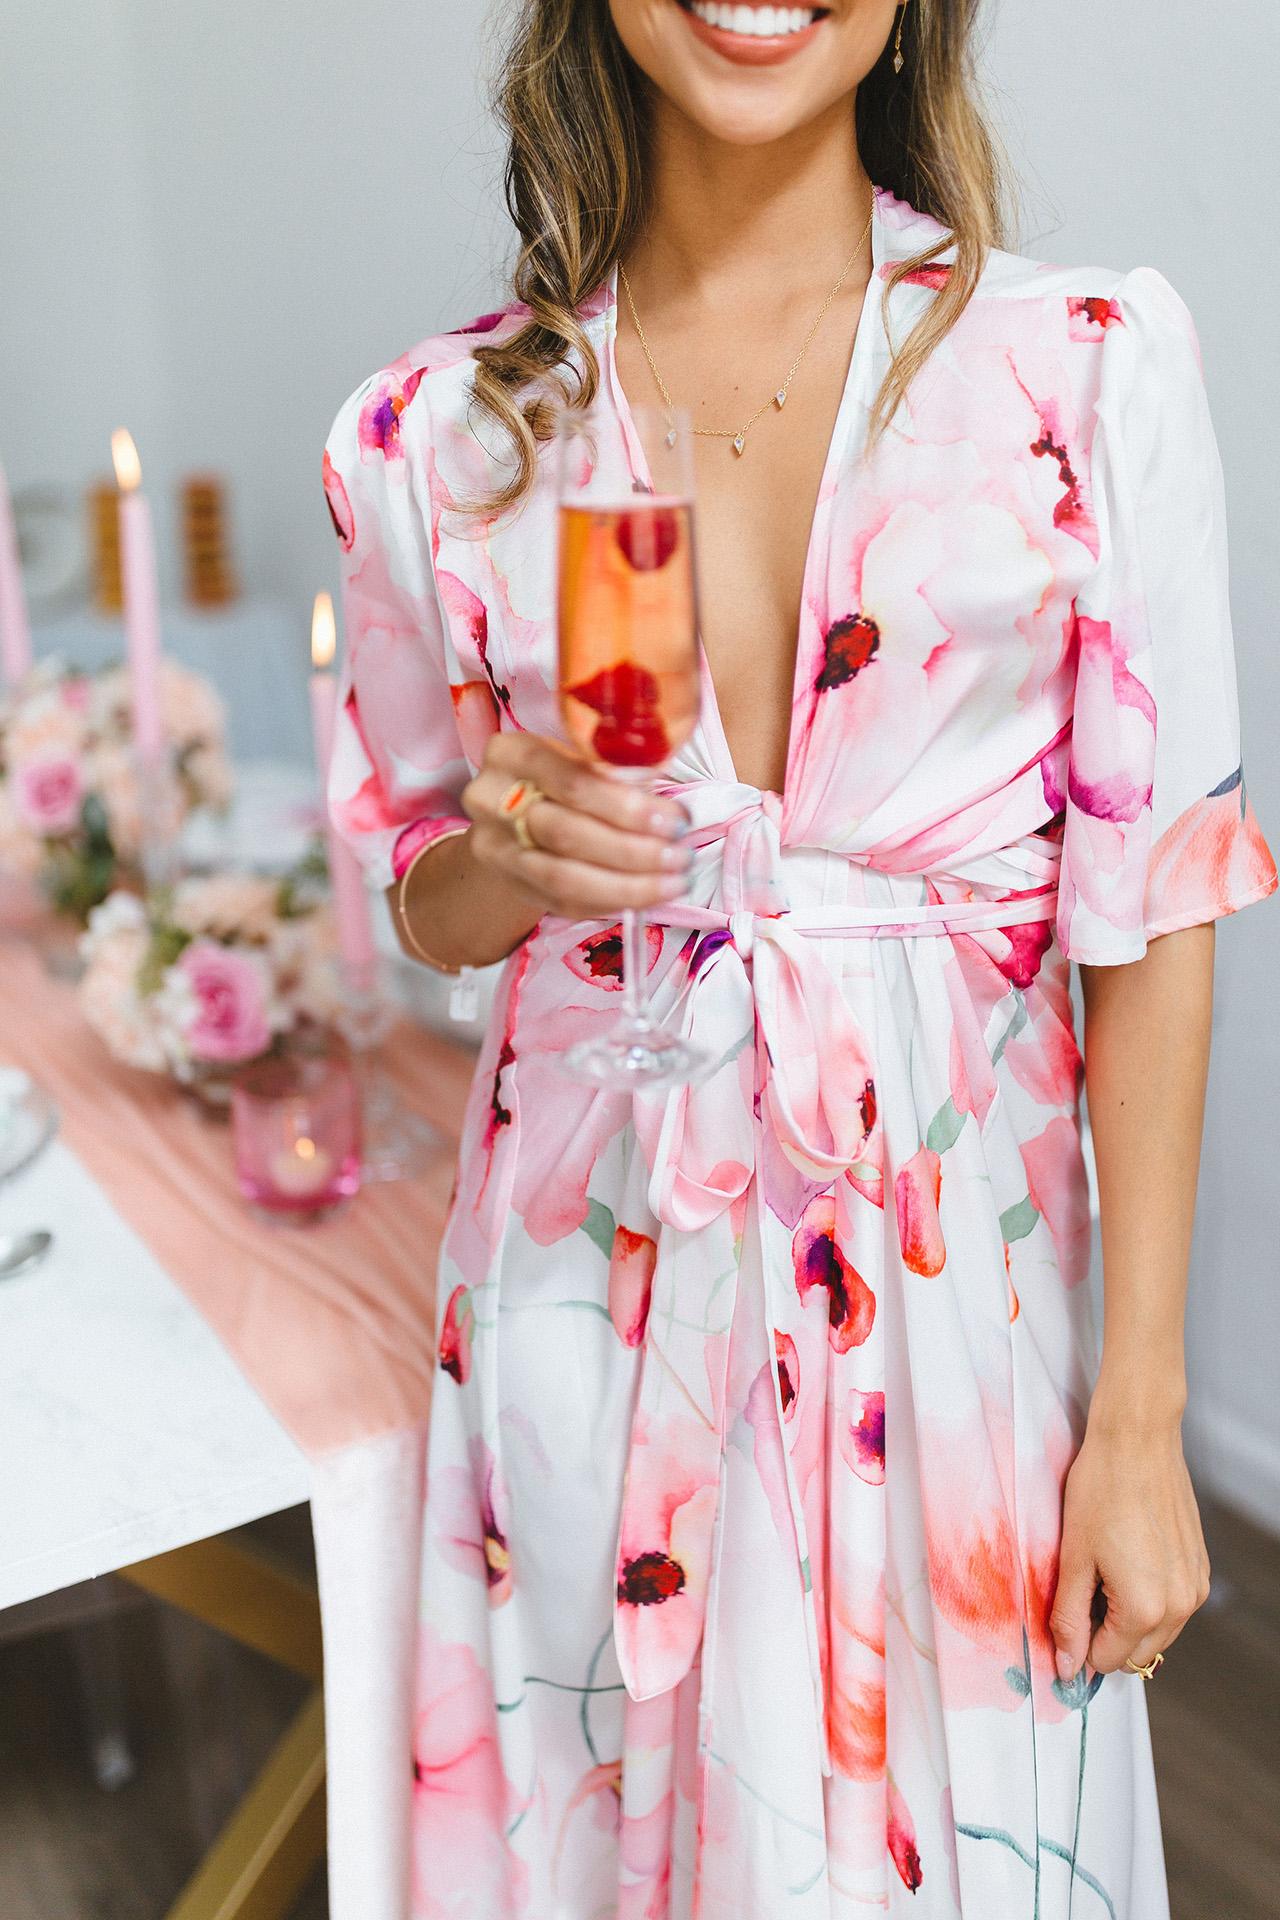 summer bridal shower ideas floral attire